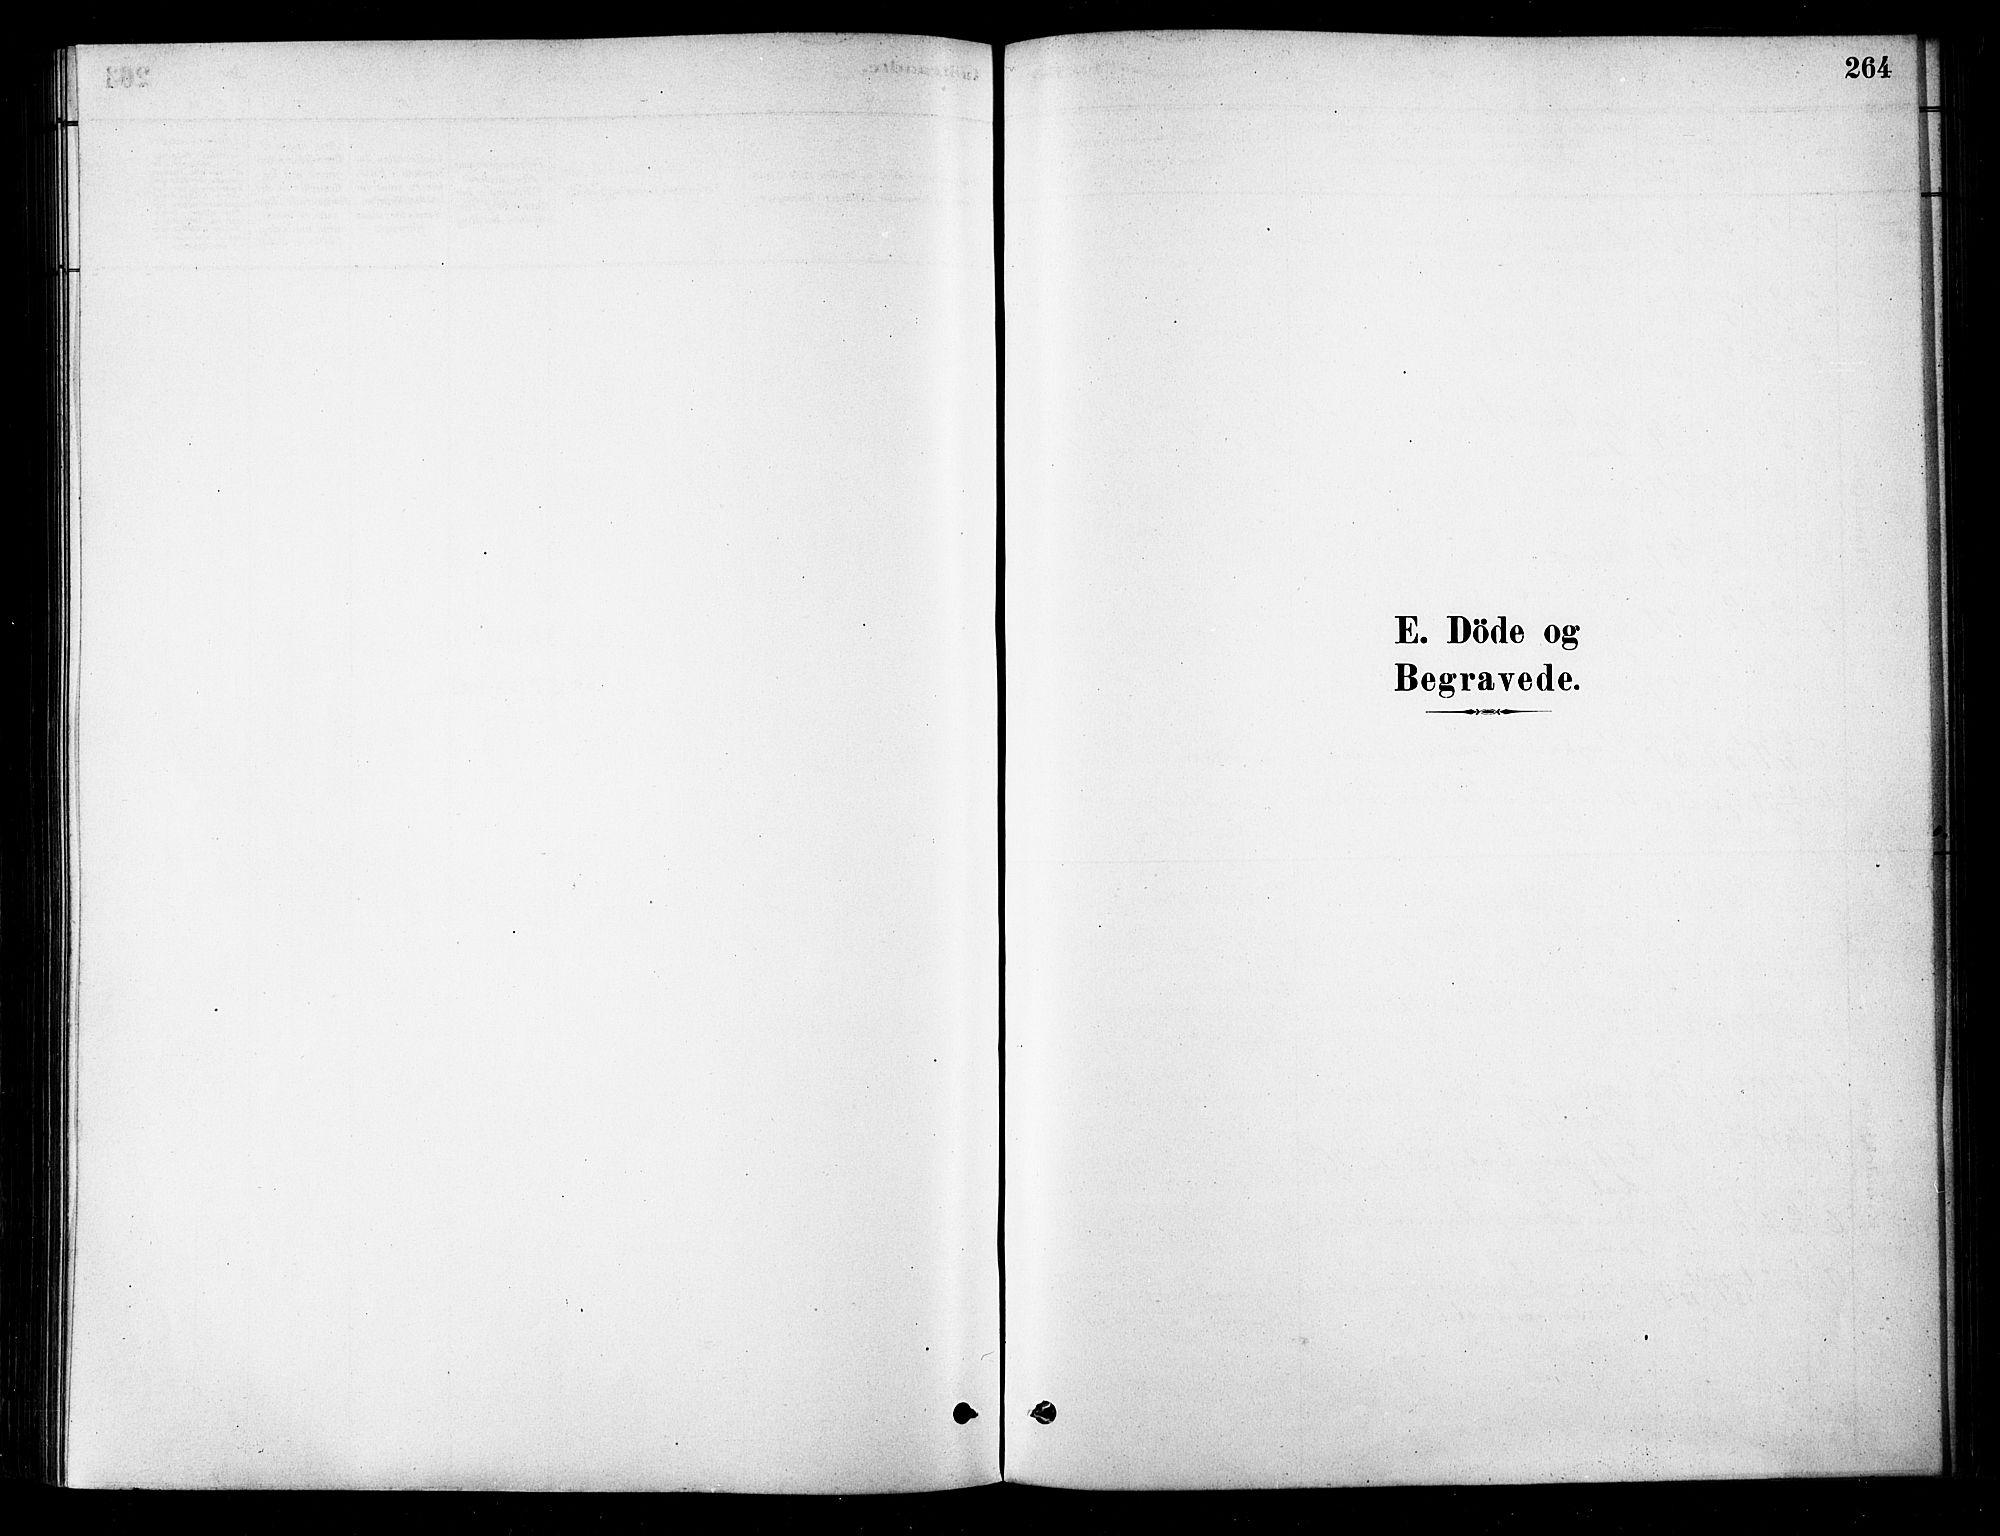 SATØ, Karlsøy sokneprestembete, H/Ha/Haa/L0006kirke: Ministerialbok nr. 6, 1879-1890, s. 264